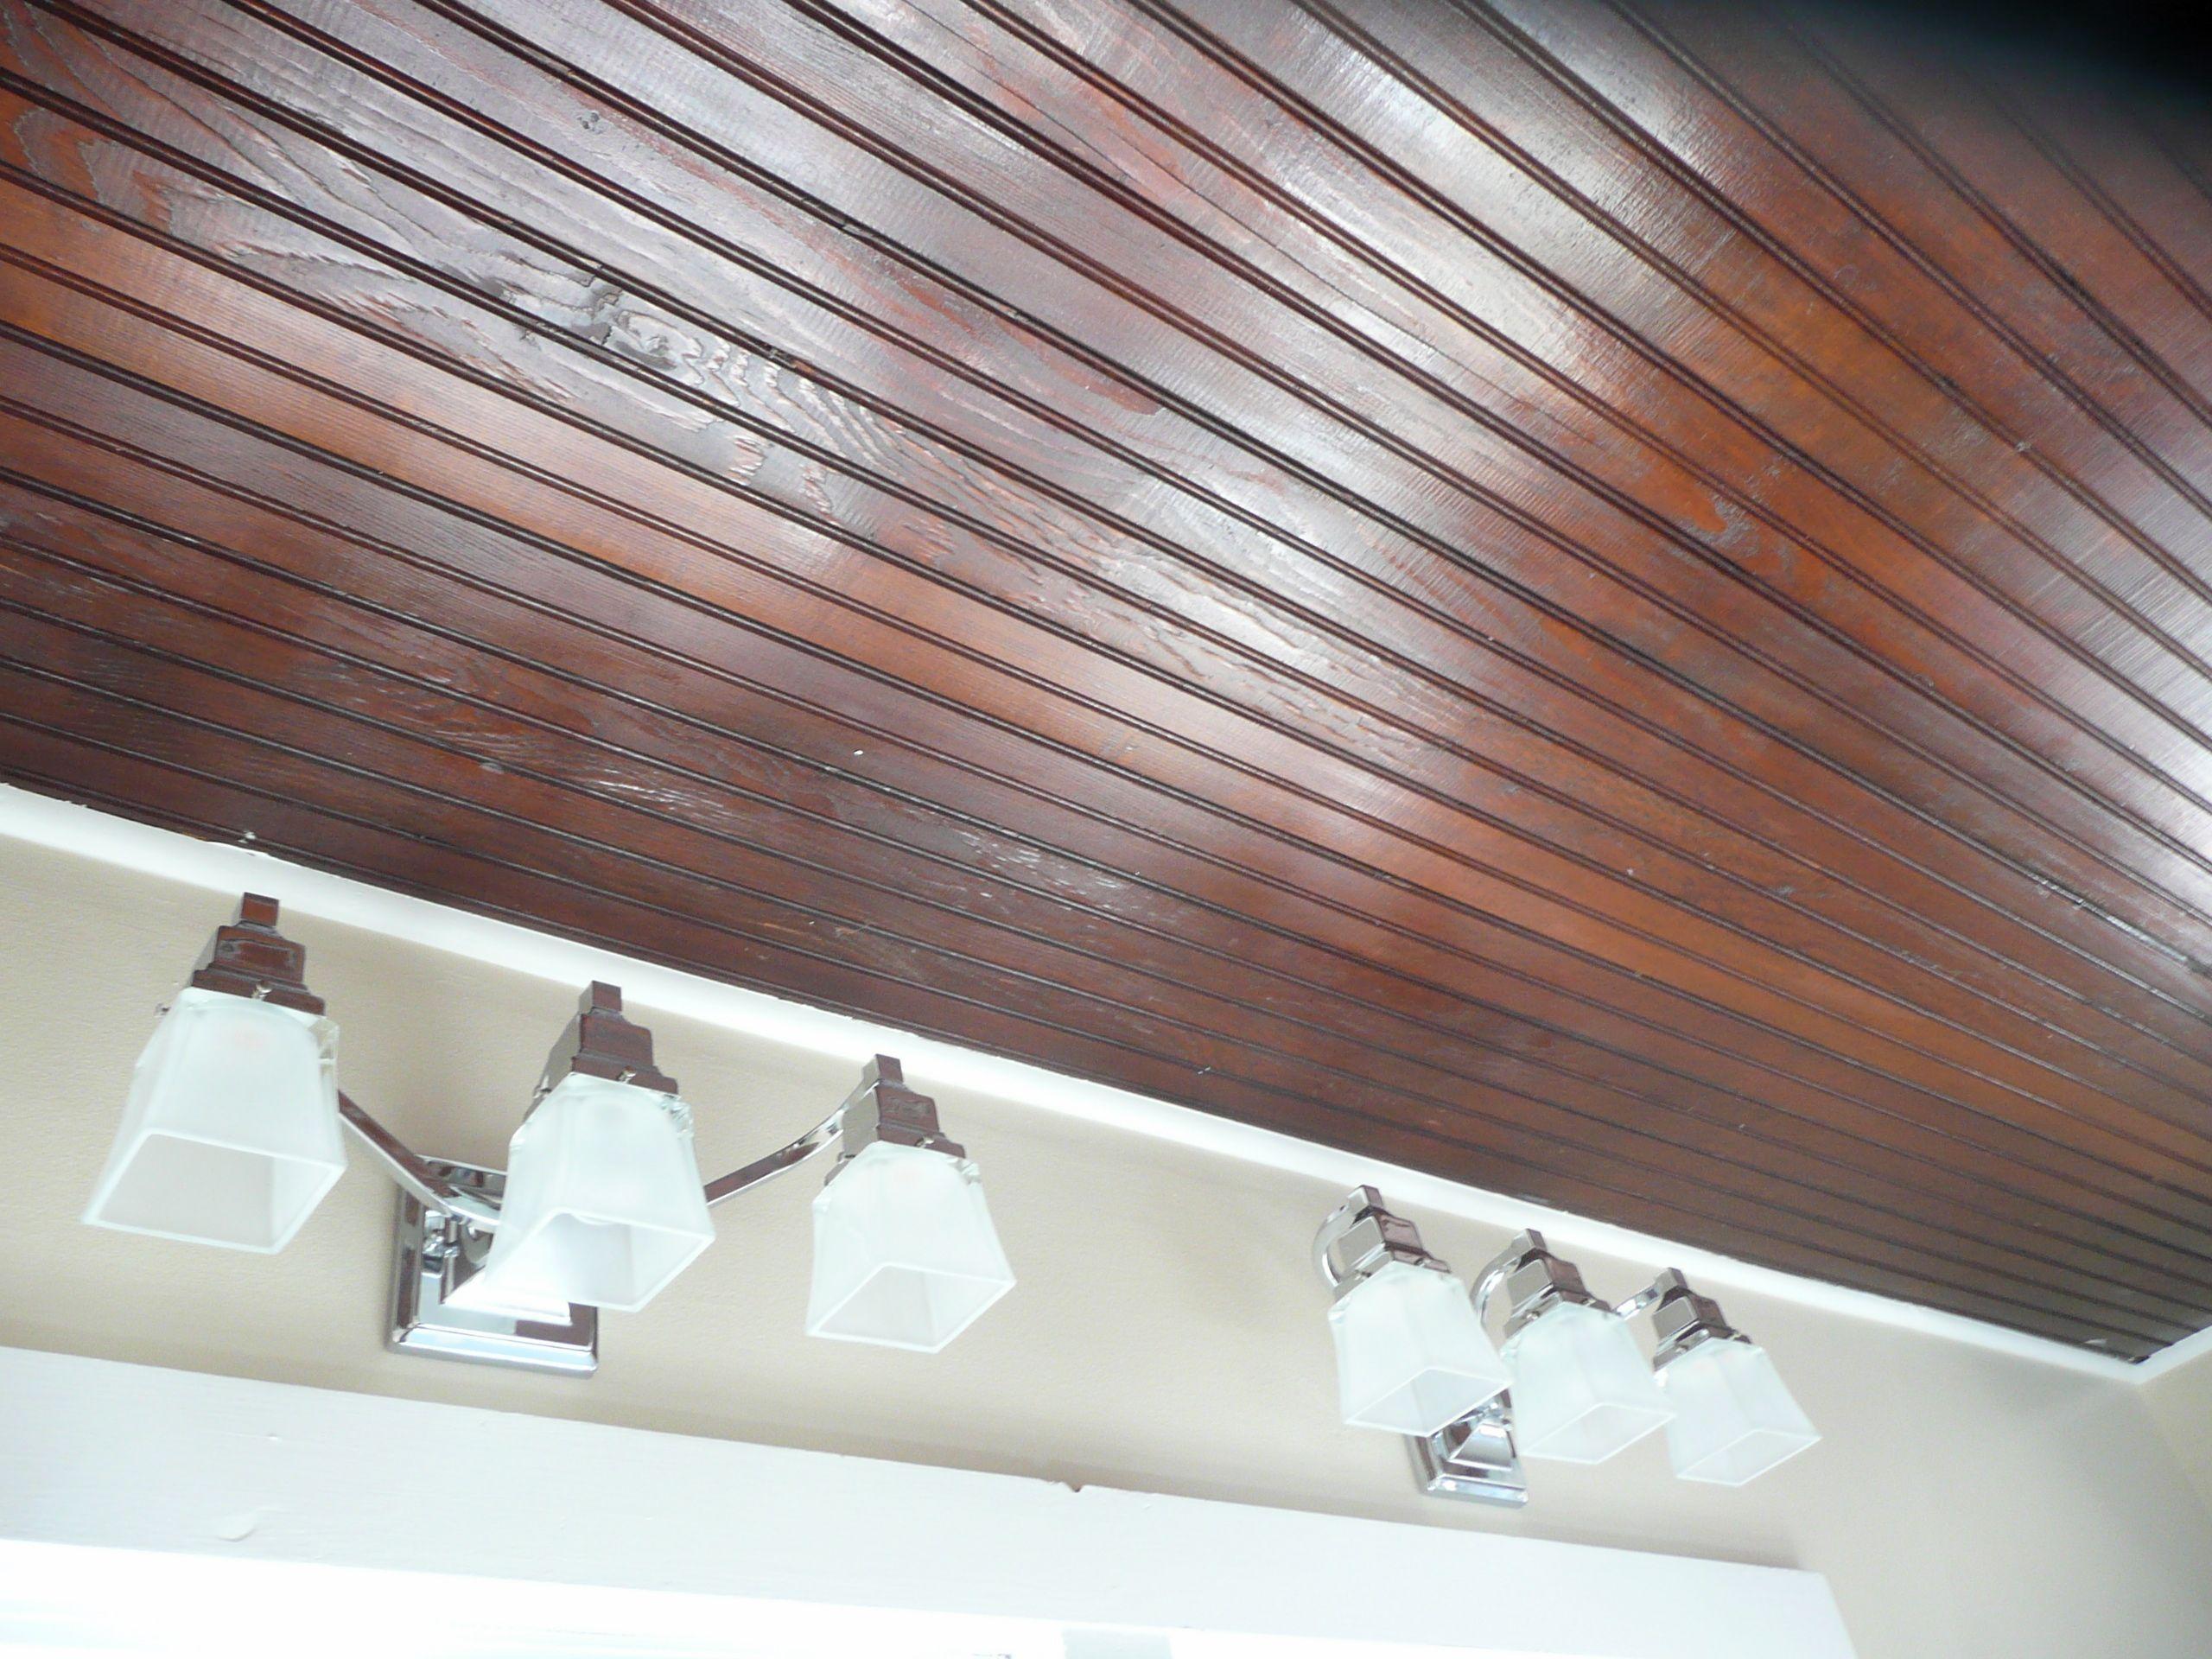 House For Sale Restored And Remodeled Potter Highlands Bungalow Denver Wood Ceiling Panels Ceiling Remodel Exterior Wood